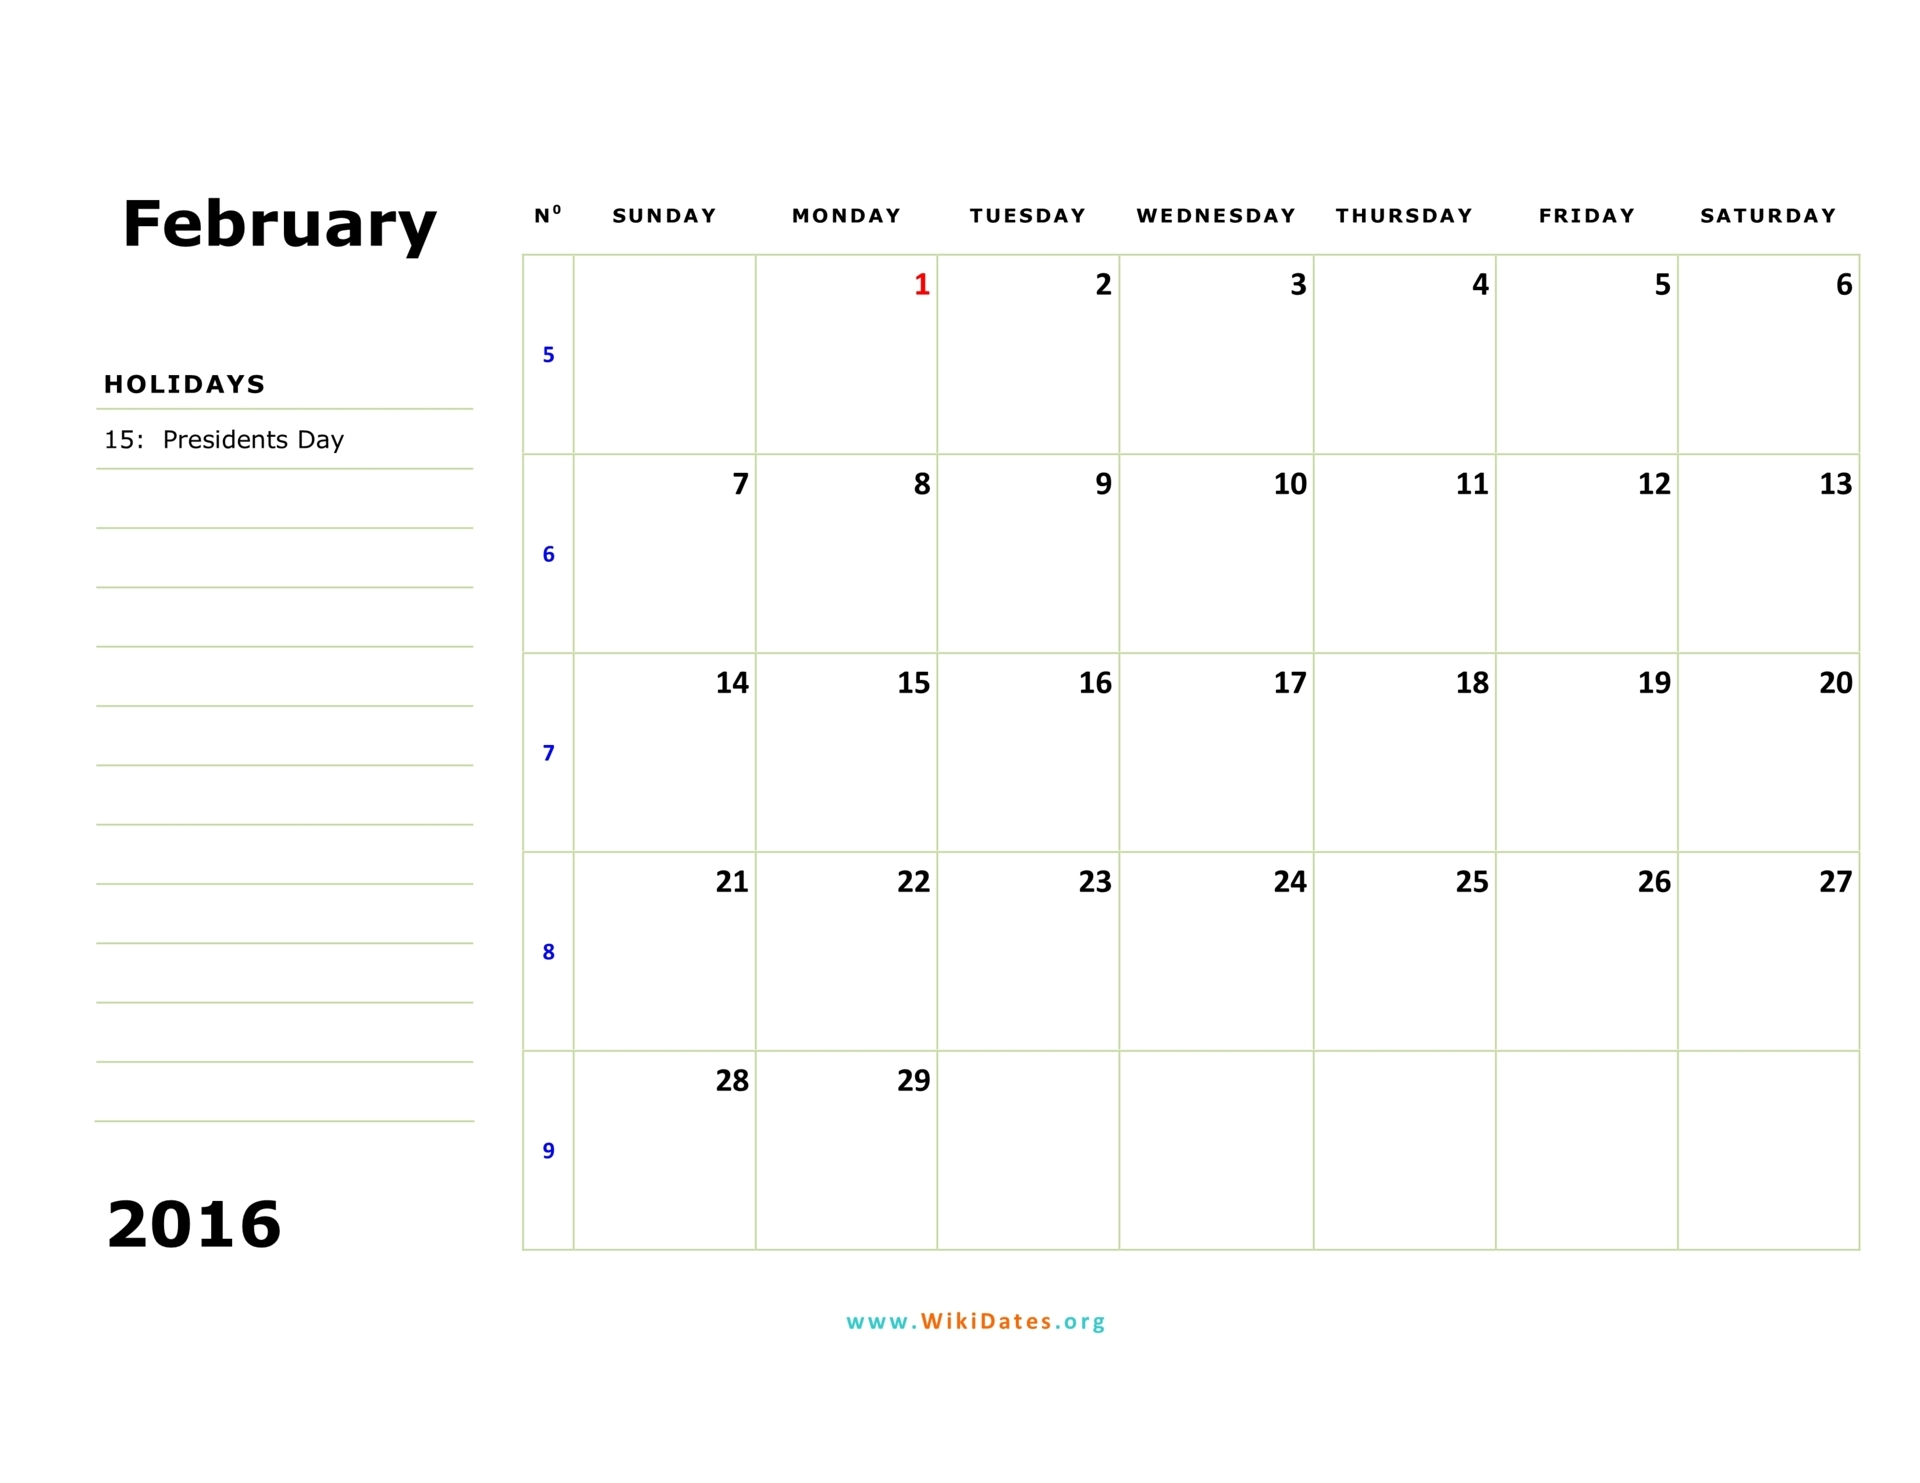 February 2016 Calendar | WikiDates.org